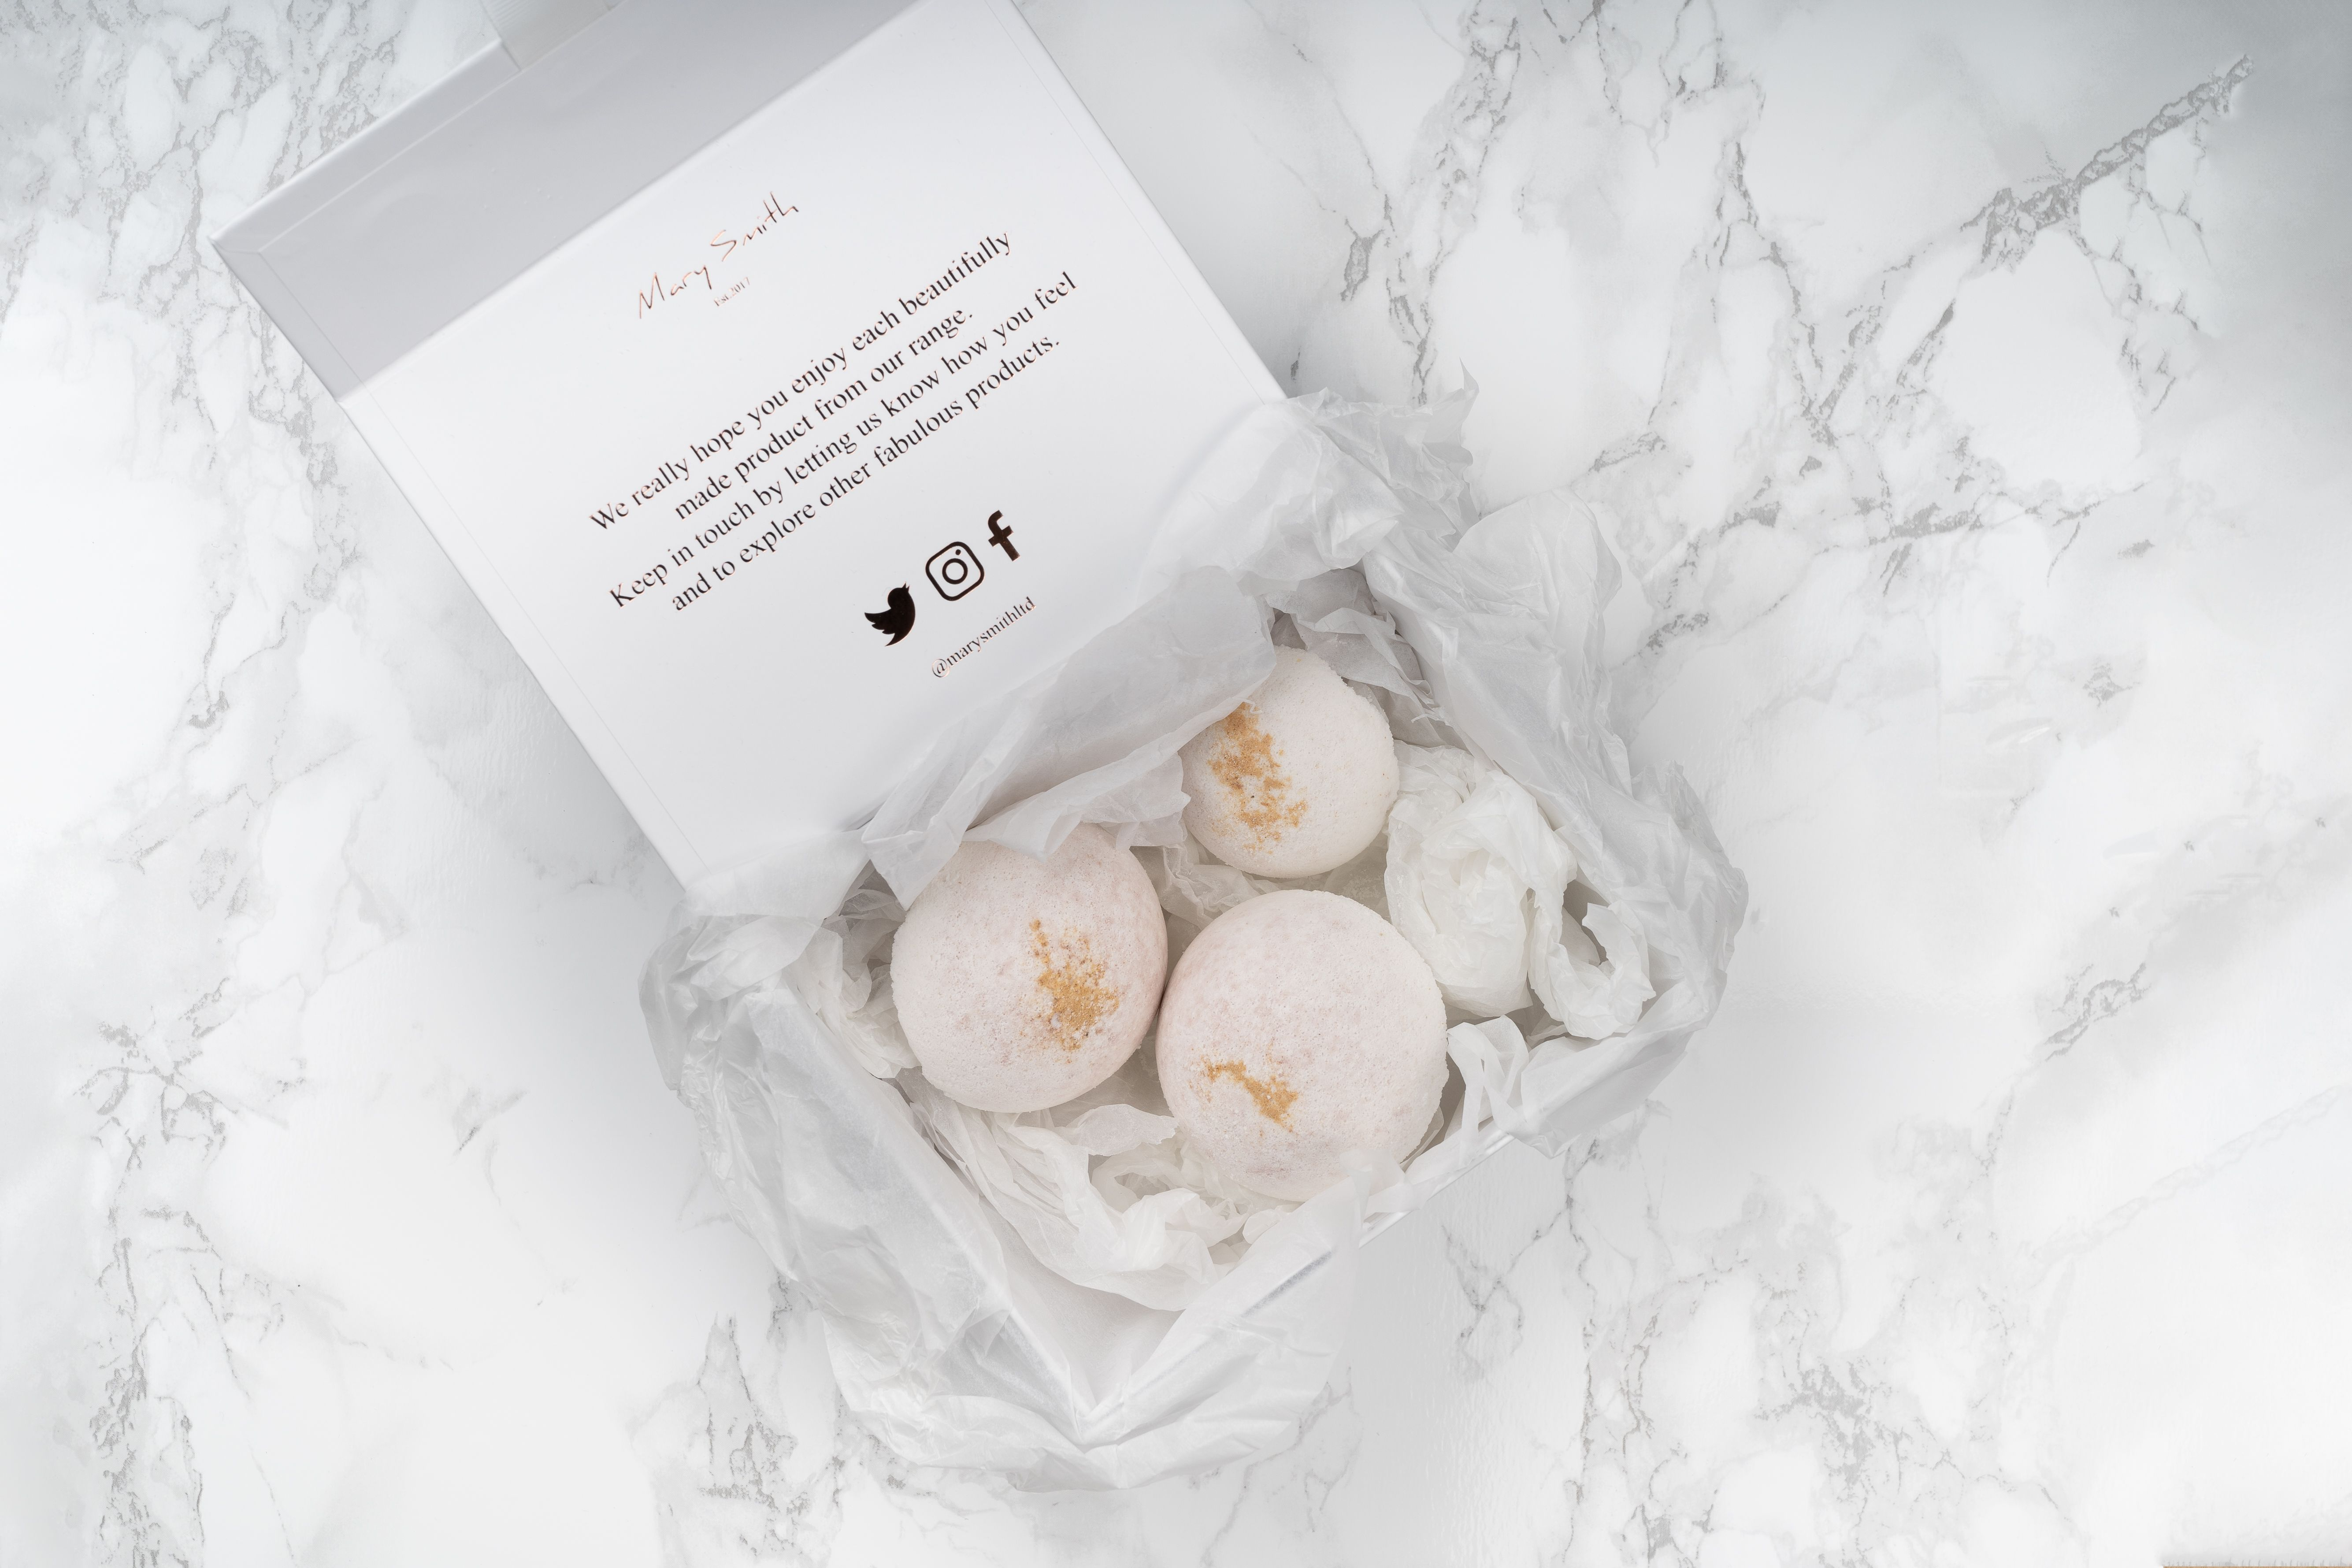 Naturally Scented Bath Bomb Set - Vanilla & Sandalwood